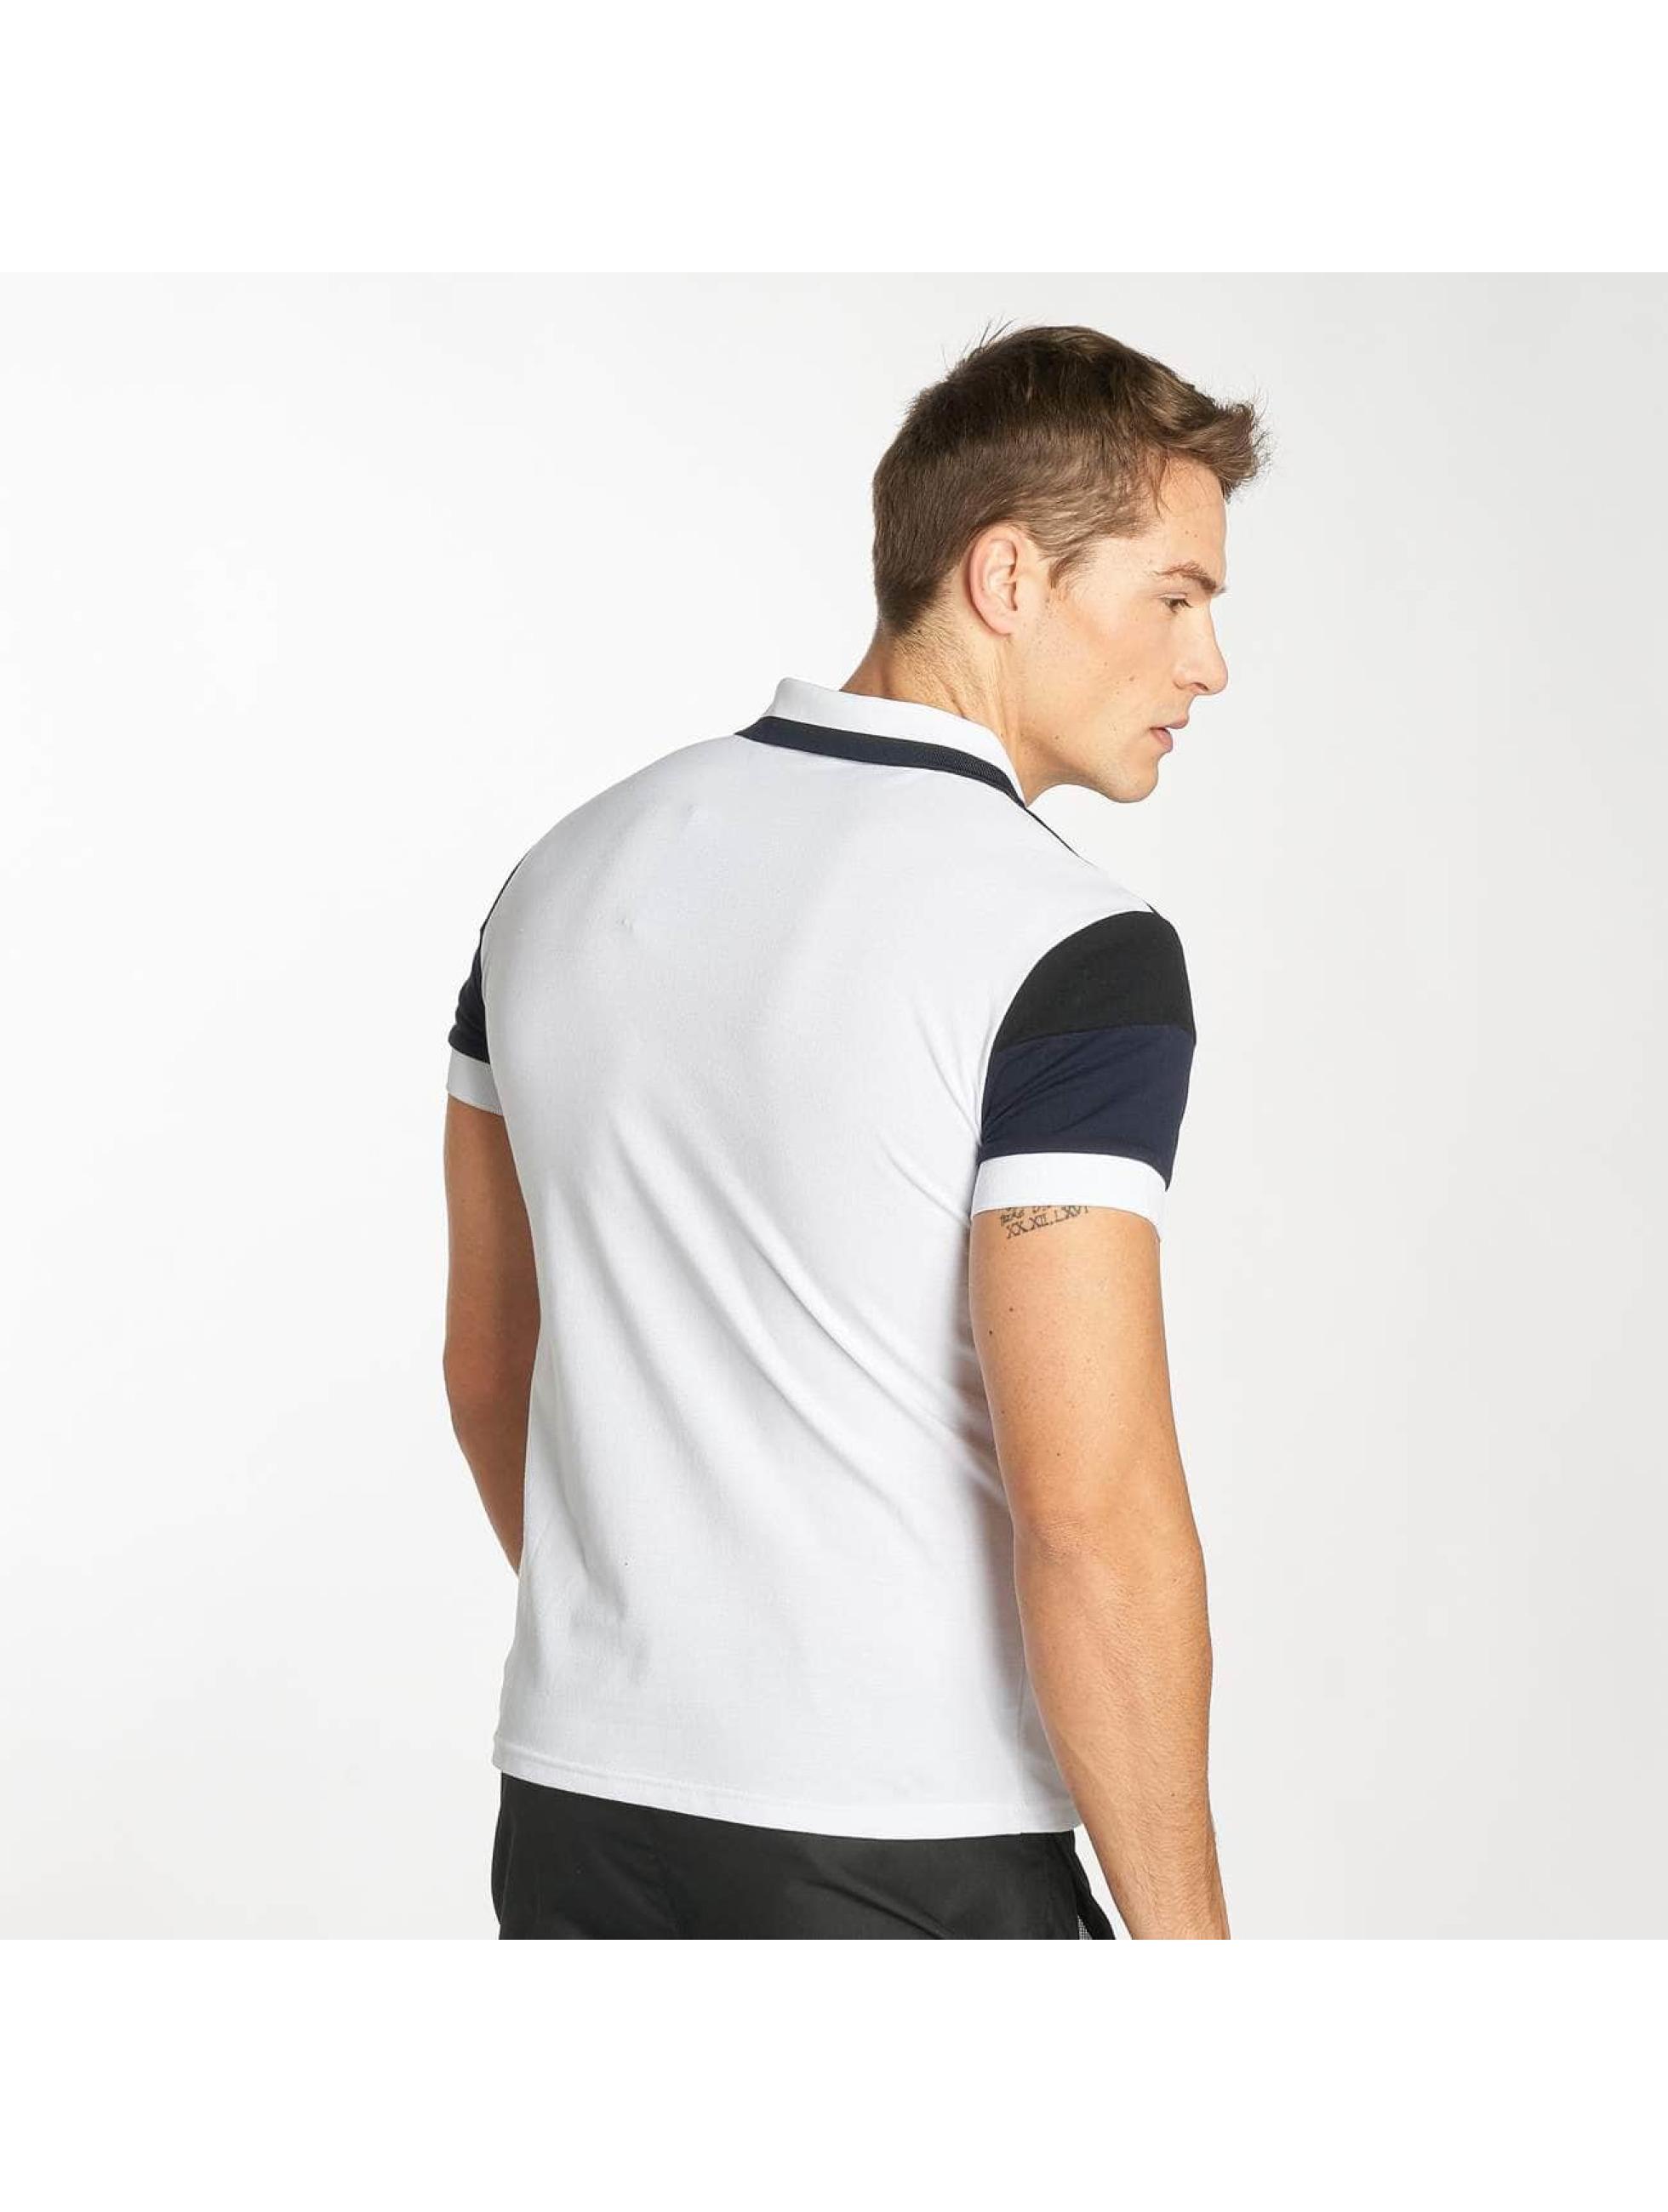 Zayne Paris Poloshirt Stripe white